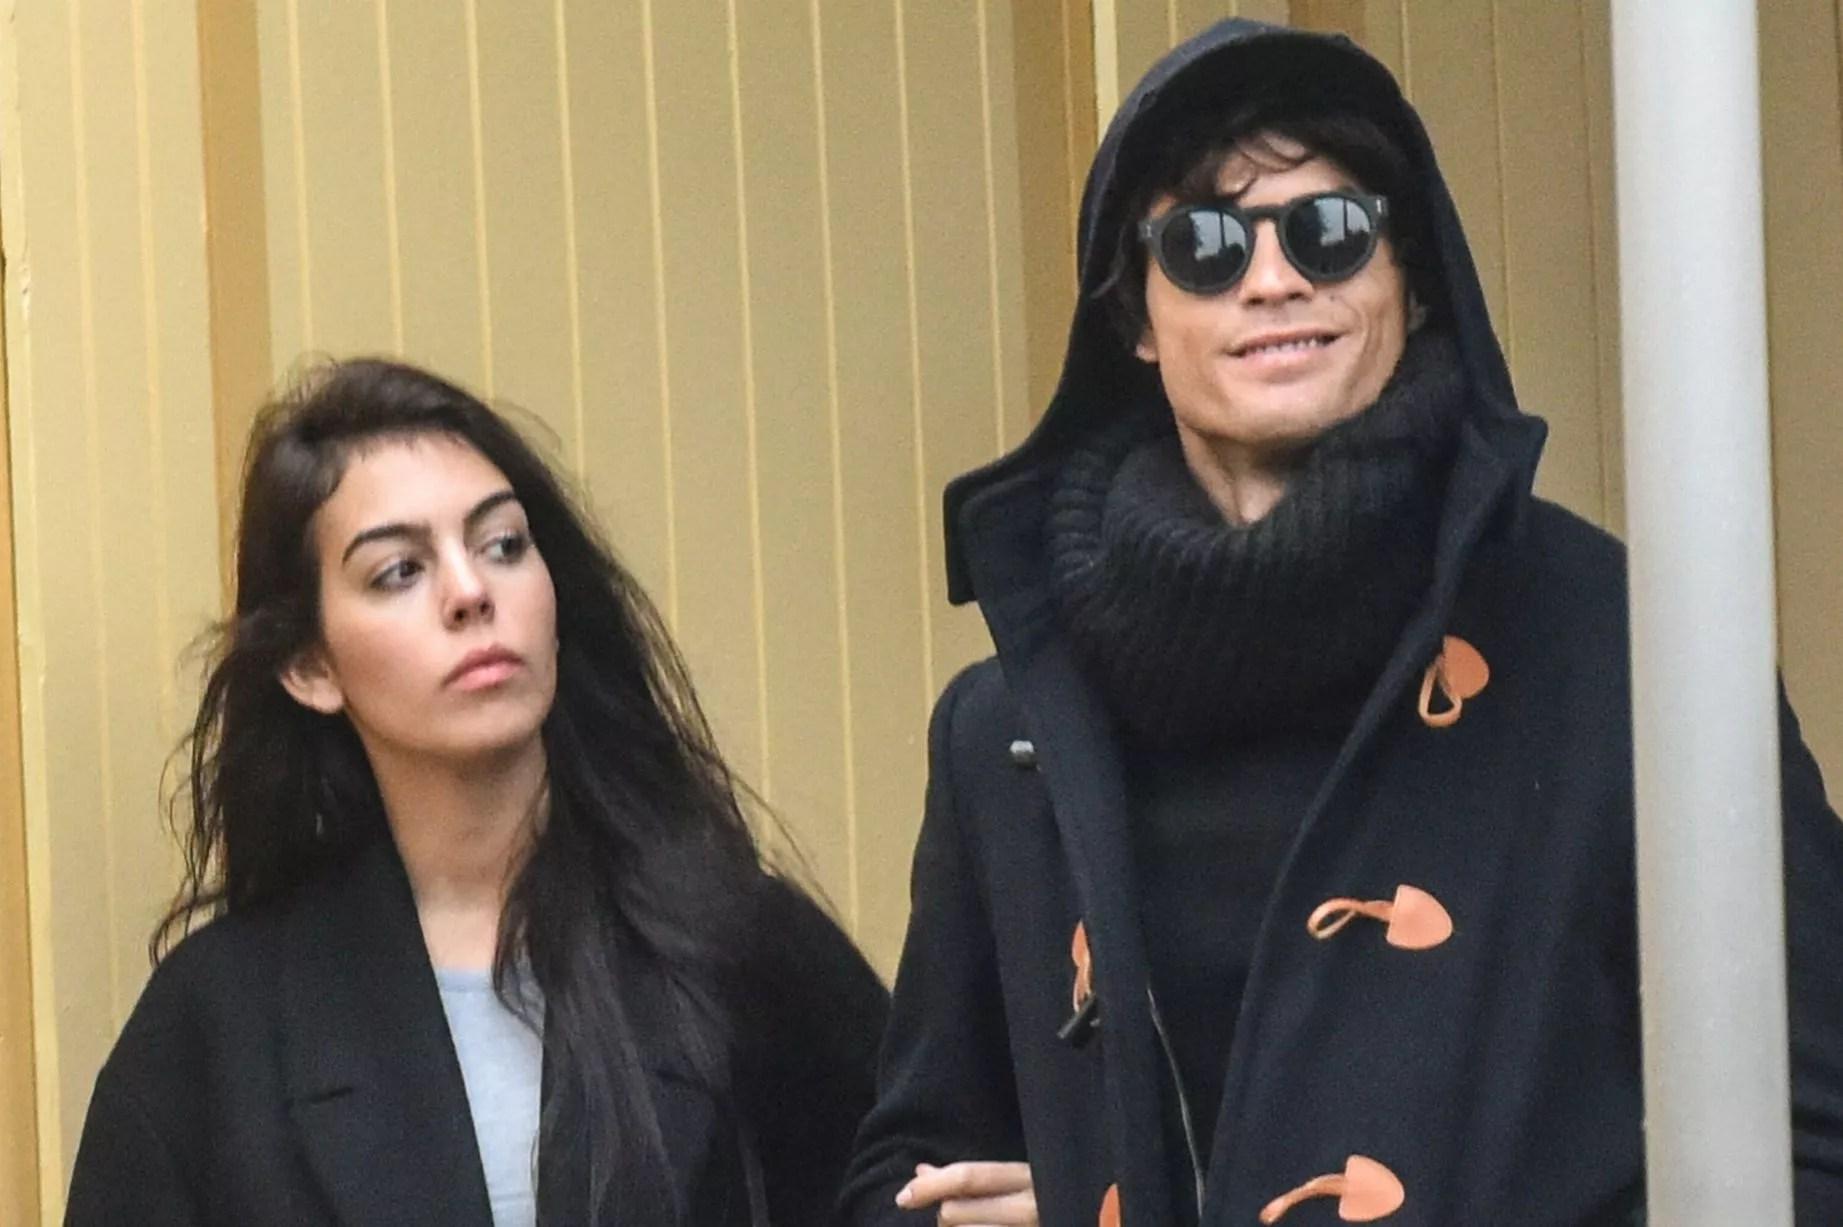 PICS] Cristiano Ronaldo\u0027s Girlfriend: Fans Bombard Georgina ...